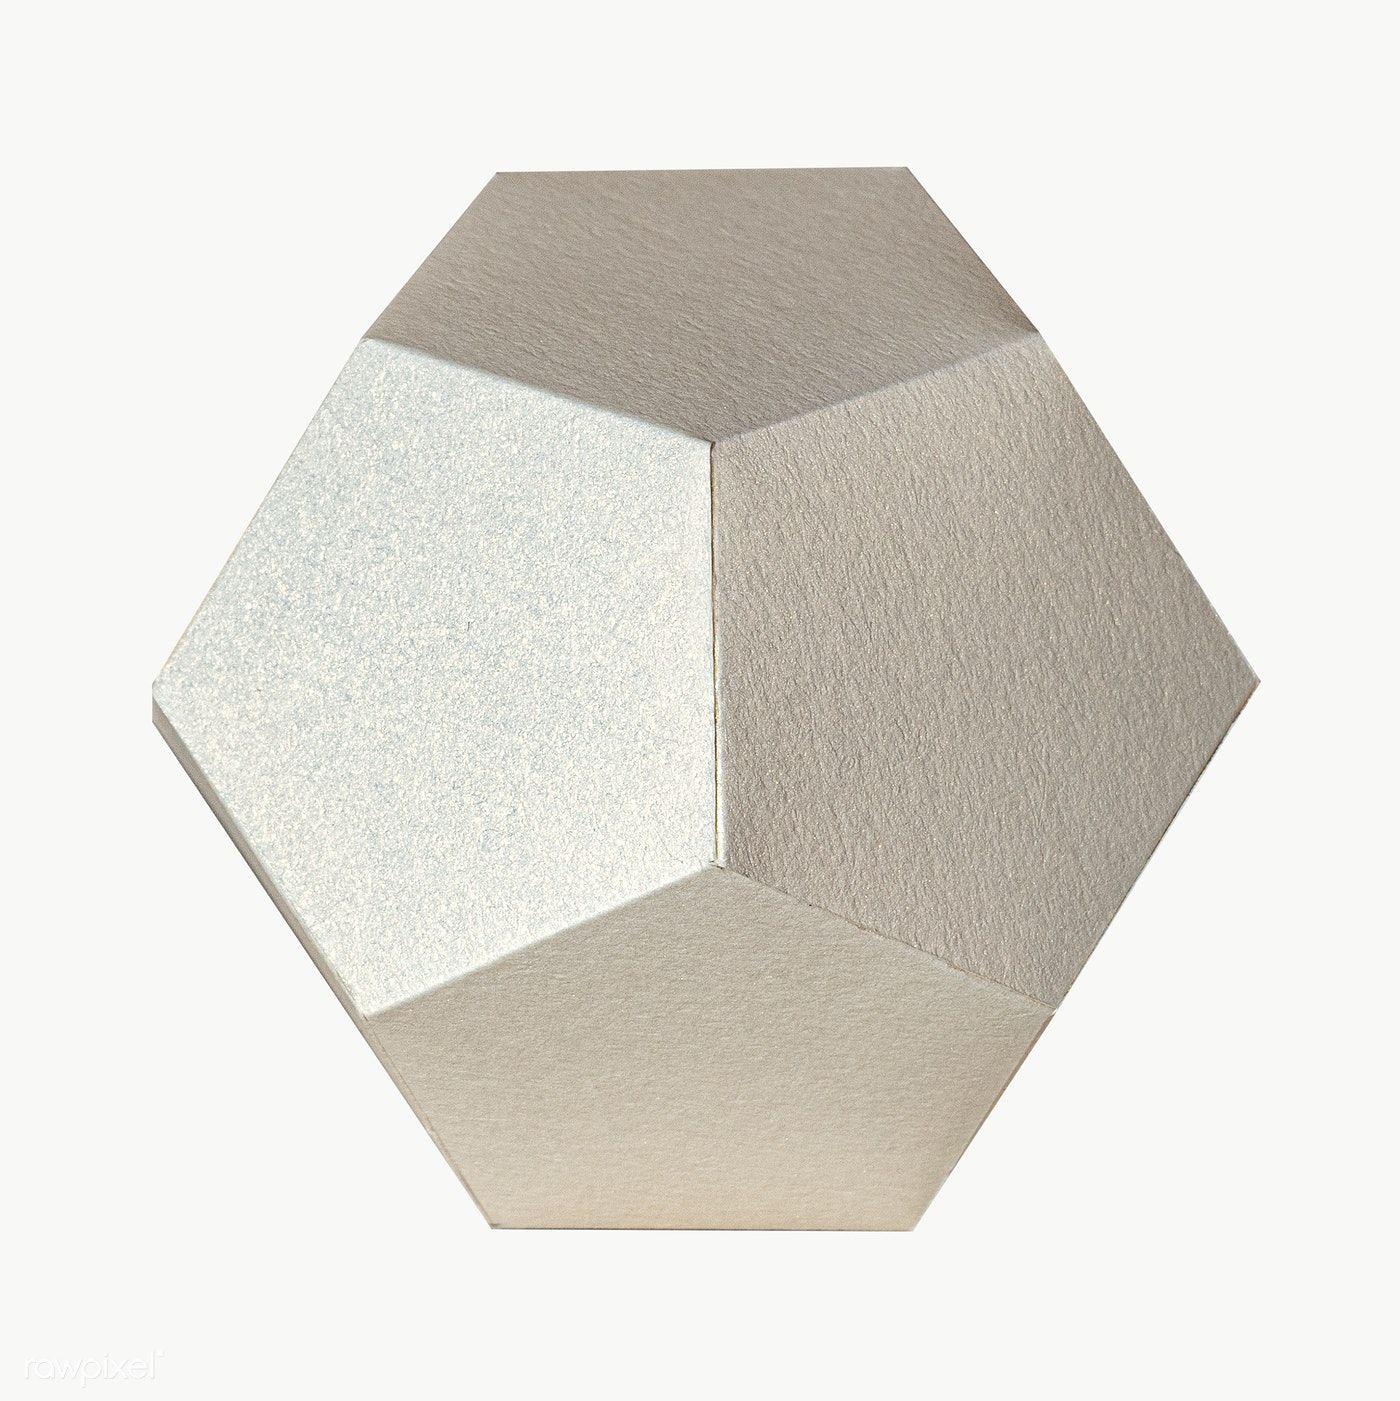 3d Silver Pentagon Paper Craft Design Element Free Image By Rawpixel Com Jira Design Element Pentagon Logo Design Crafts